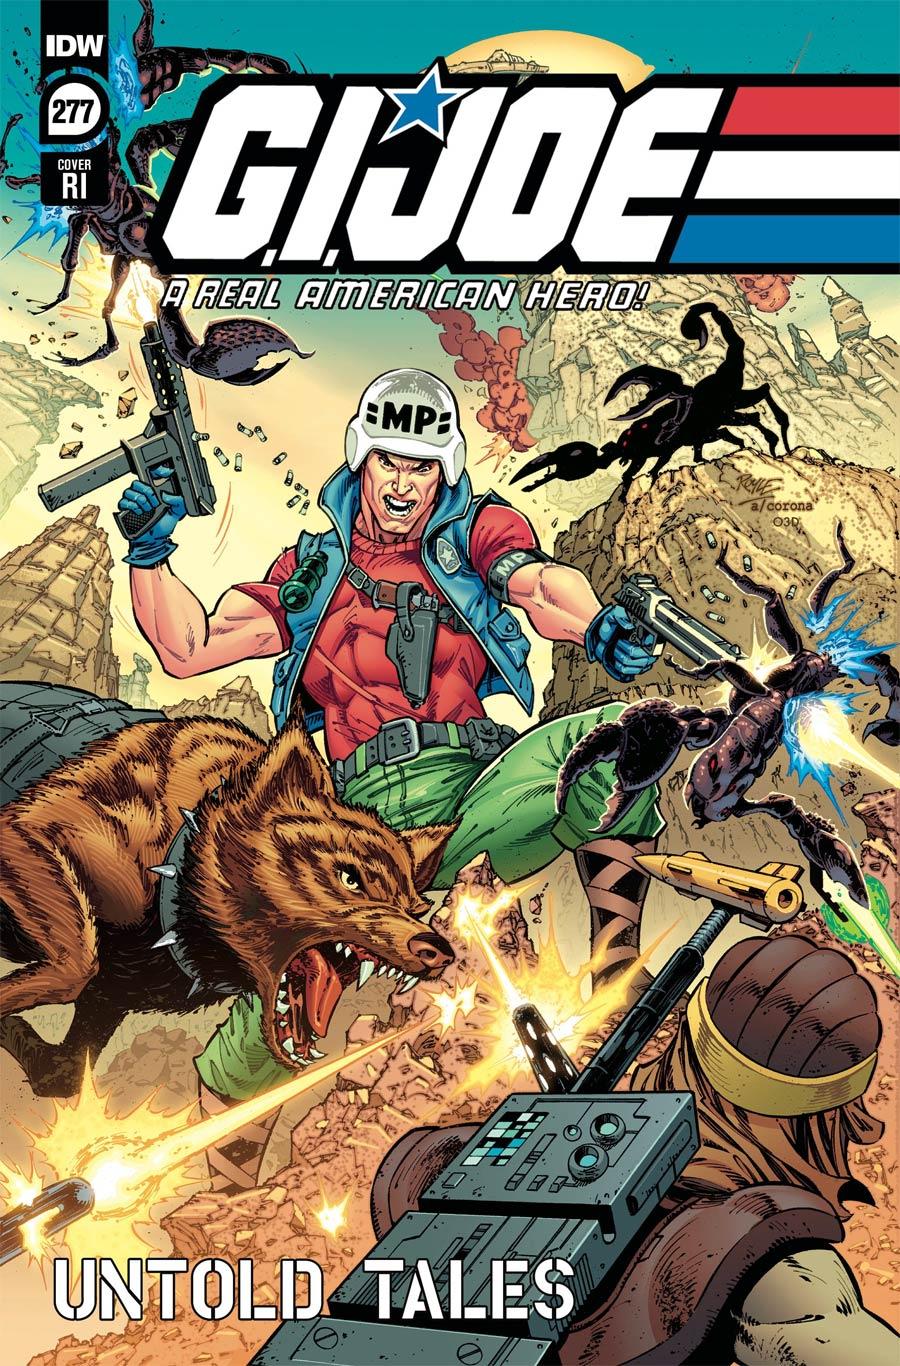 GI Joe A Real American Hero #277 Cover C Incentive John Royle Variant Cover